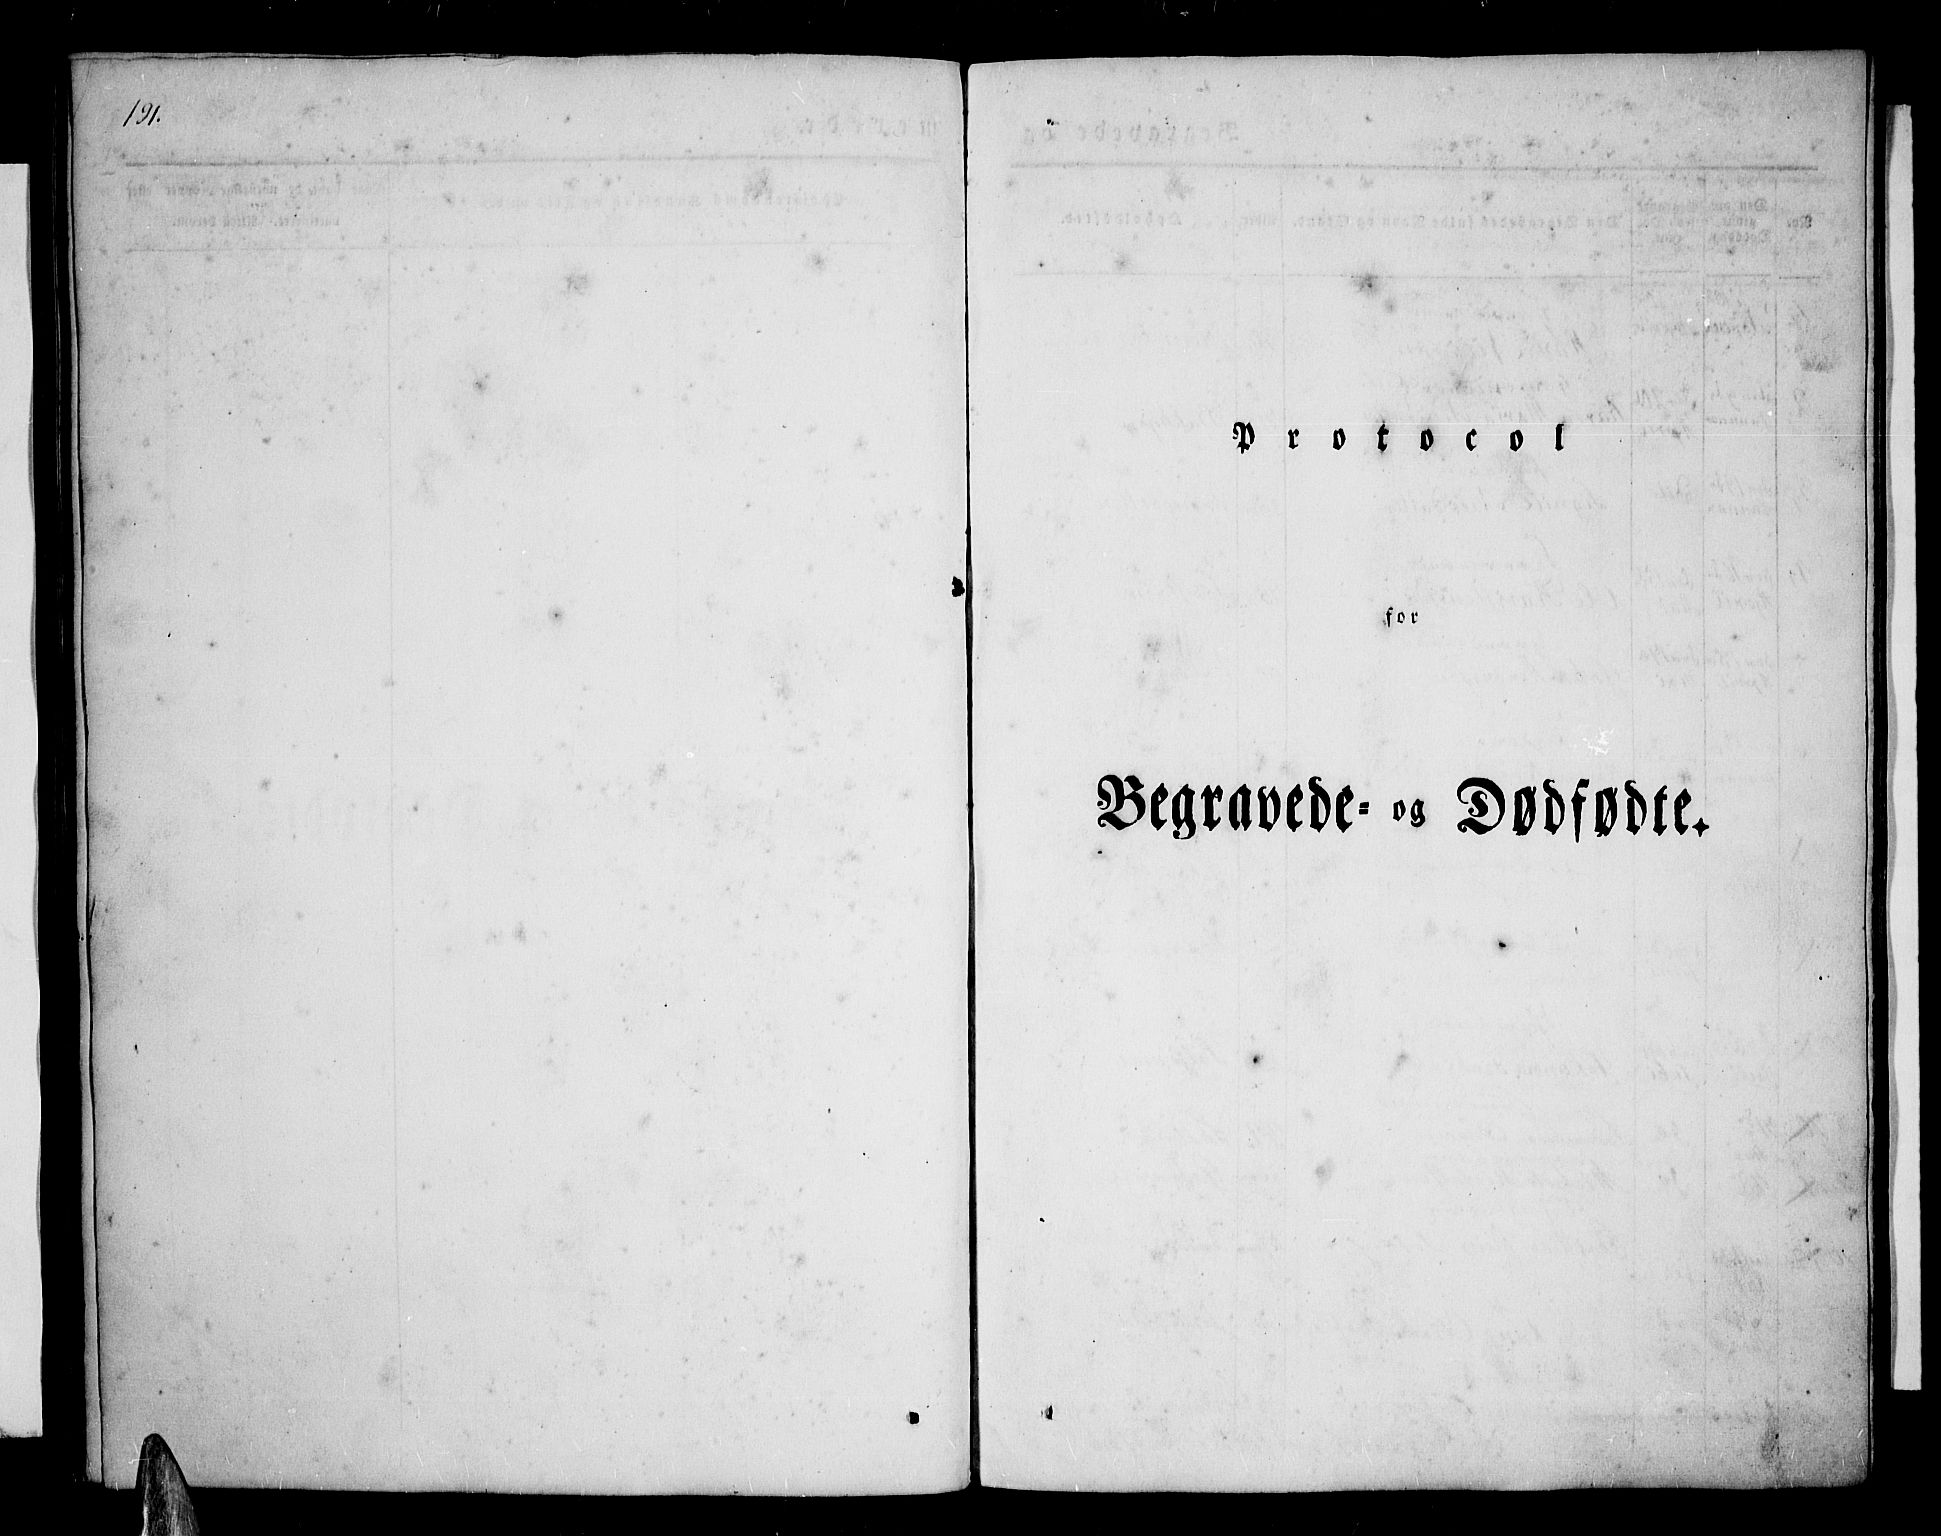 SATØ, Tranøy sokneprestkontor, I/Ia/Iab/L0001klokker: Klokkerbok nr. 1, 1835-1853, s. 191